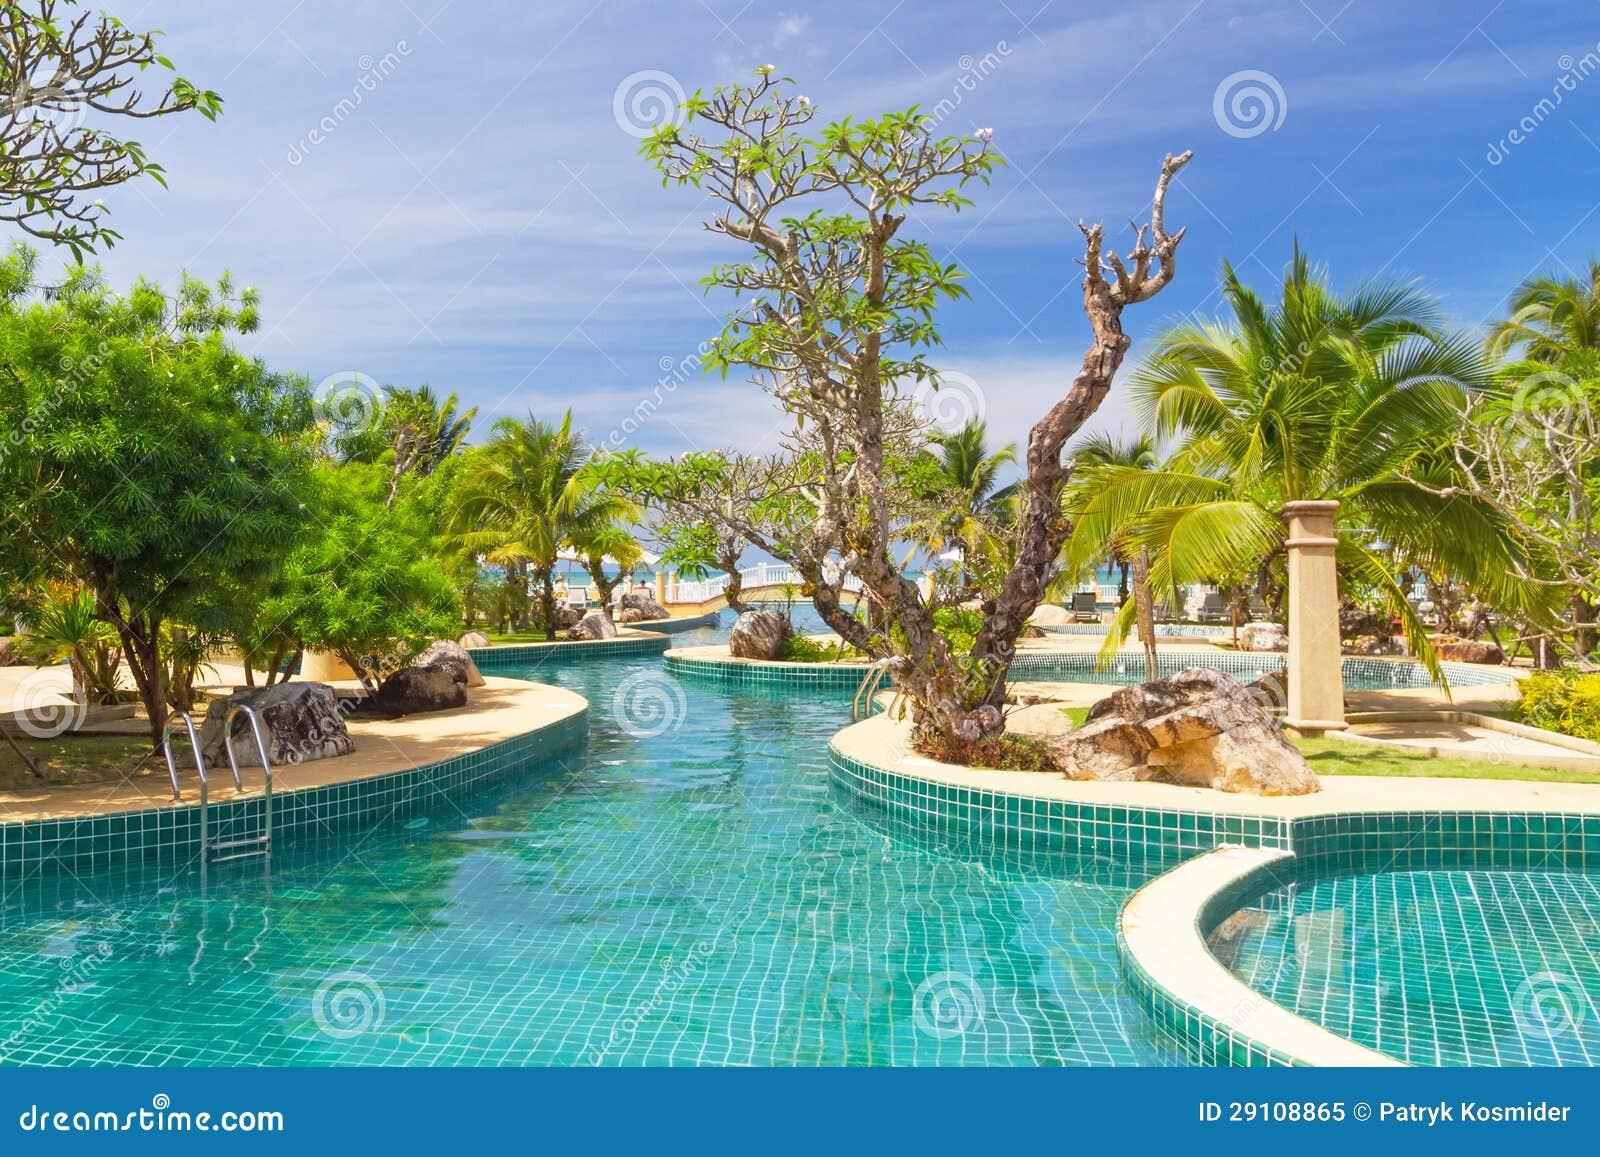 Paysage tropical de jardin en tha lande for Paysage de jardin